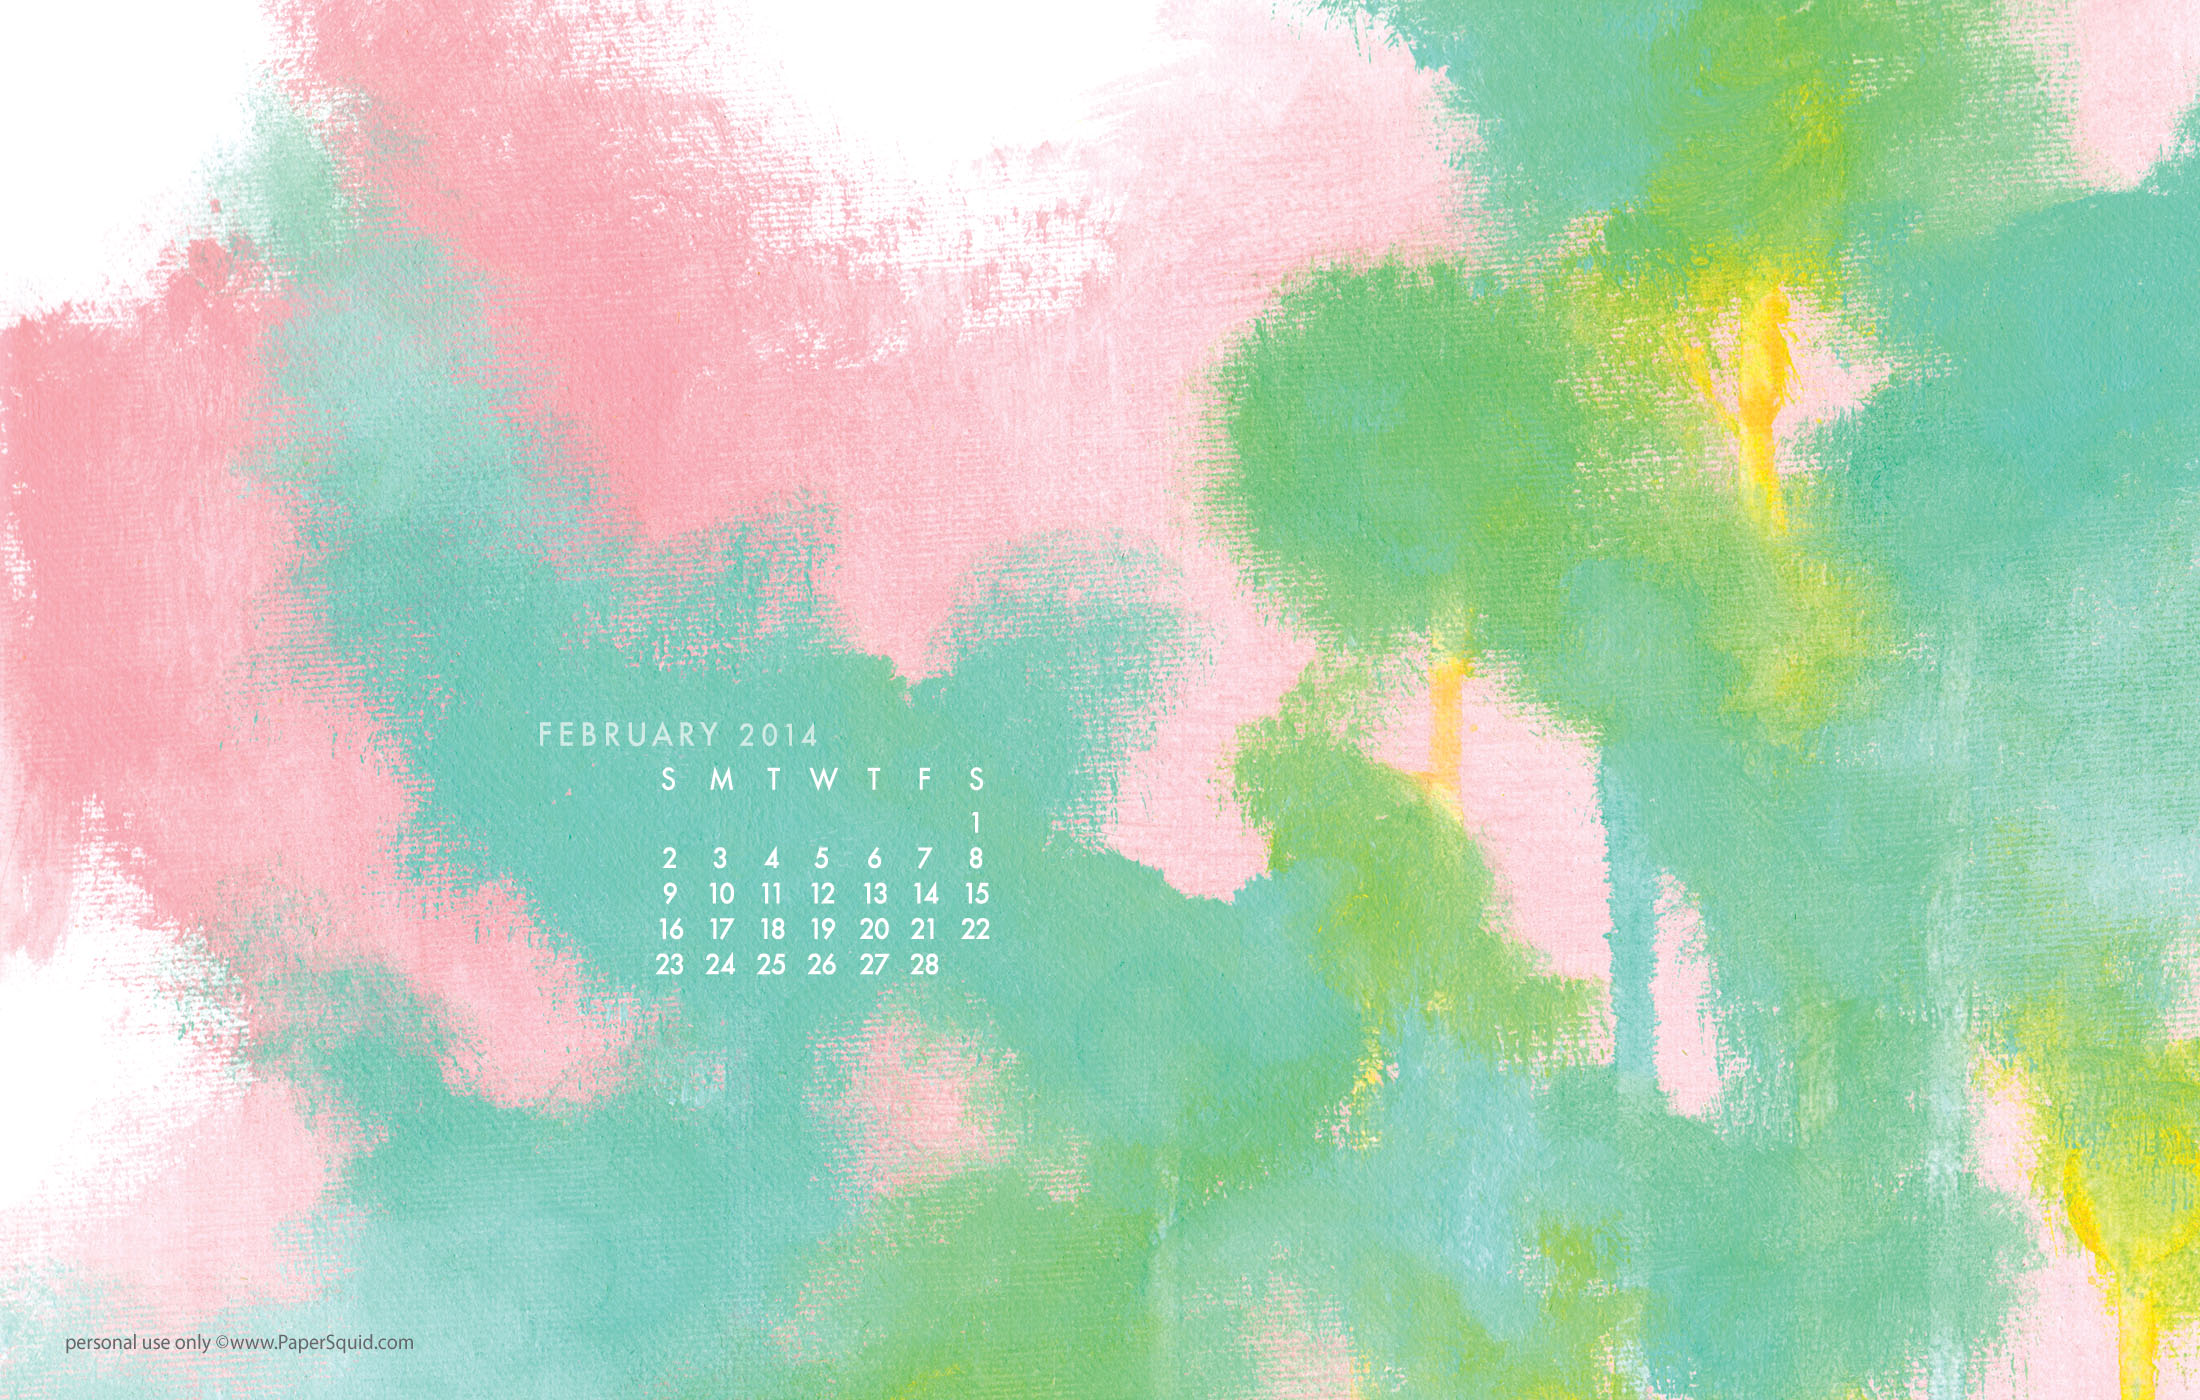 February 2014 calendar desktop wallpaper download here 2200x1400